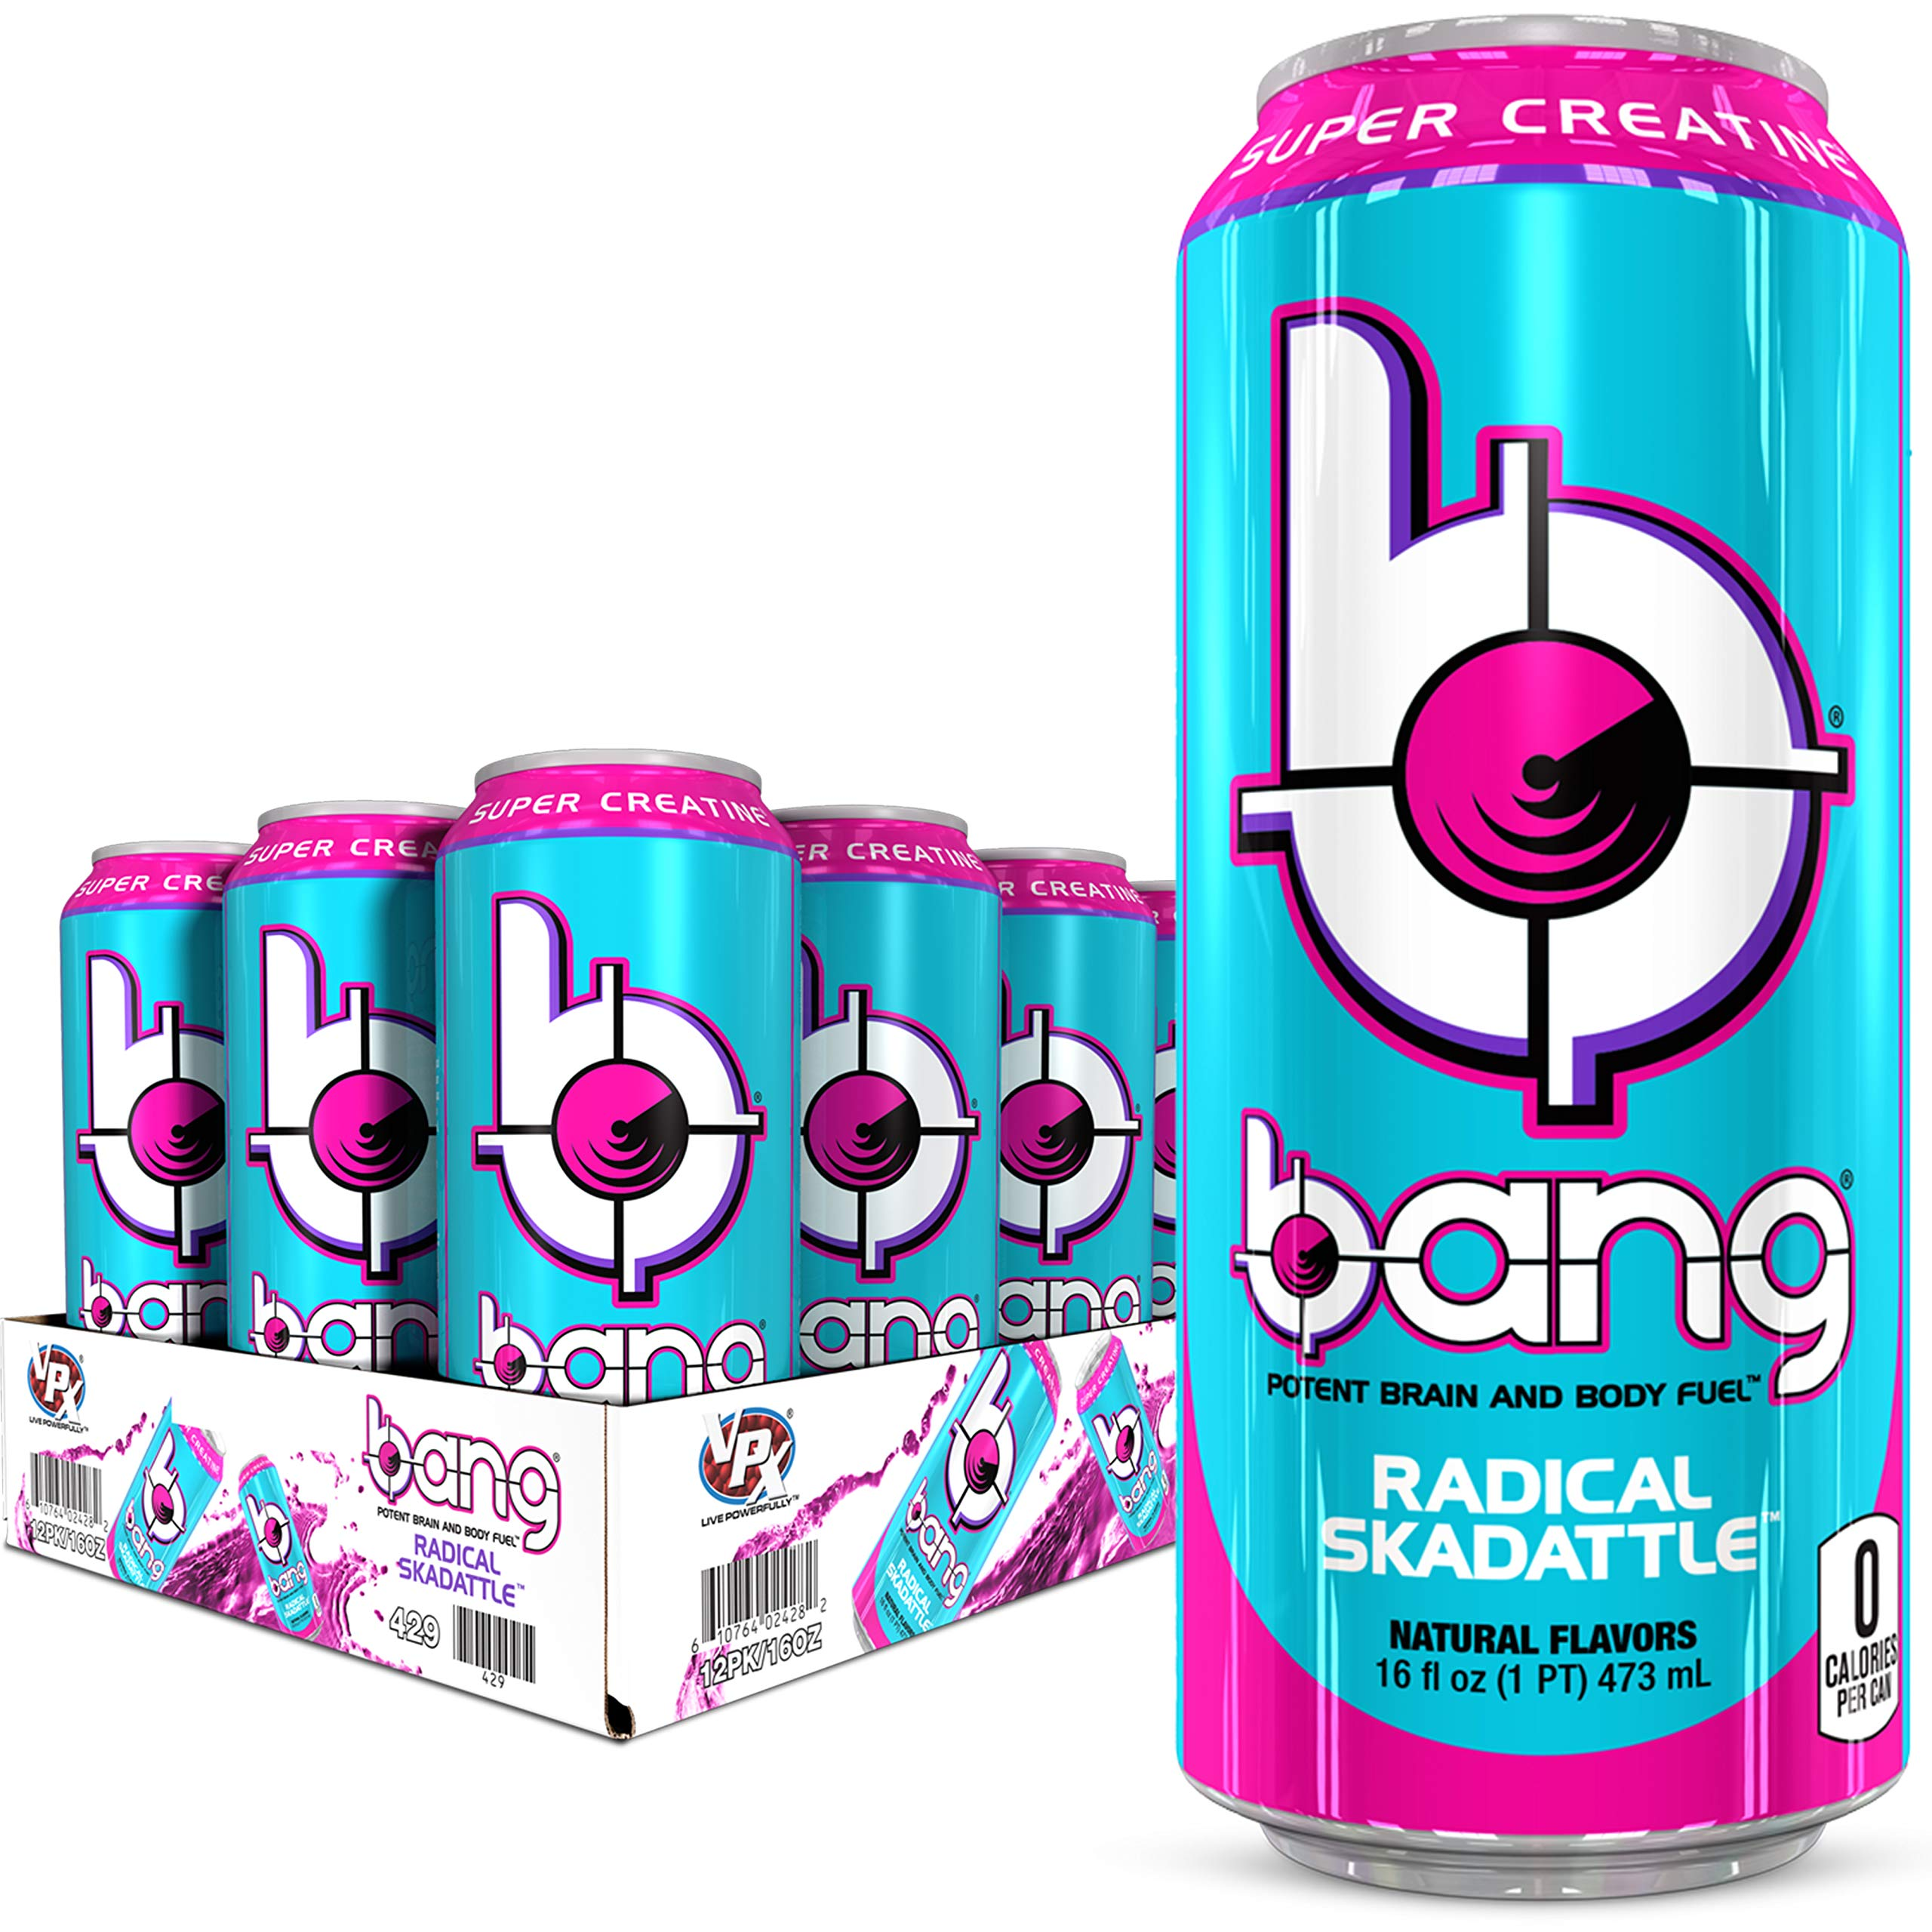 VPX Bang Radical Skadattle Energy Drink, 0 Calories, Sugar Free with Super Creatine, 16 Fl Oz (Pack of 12)